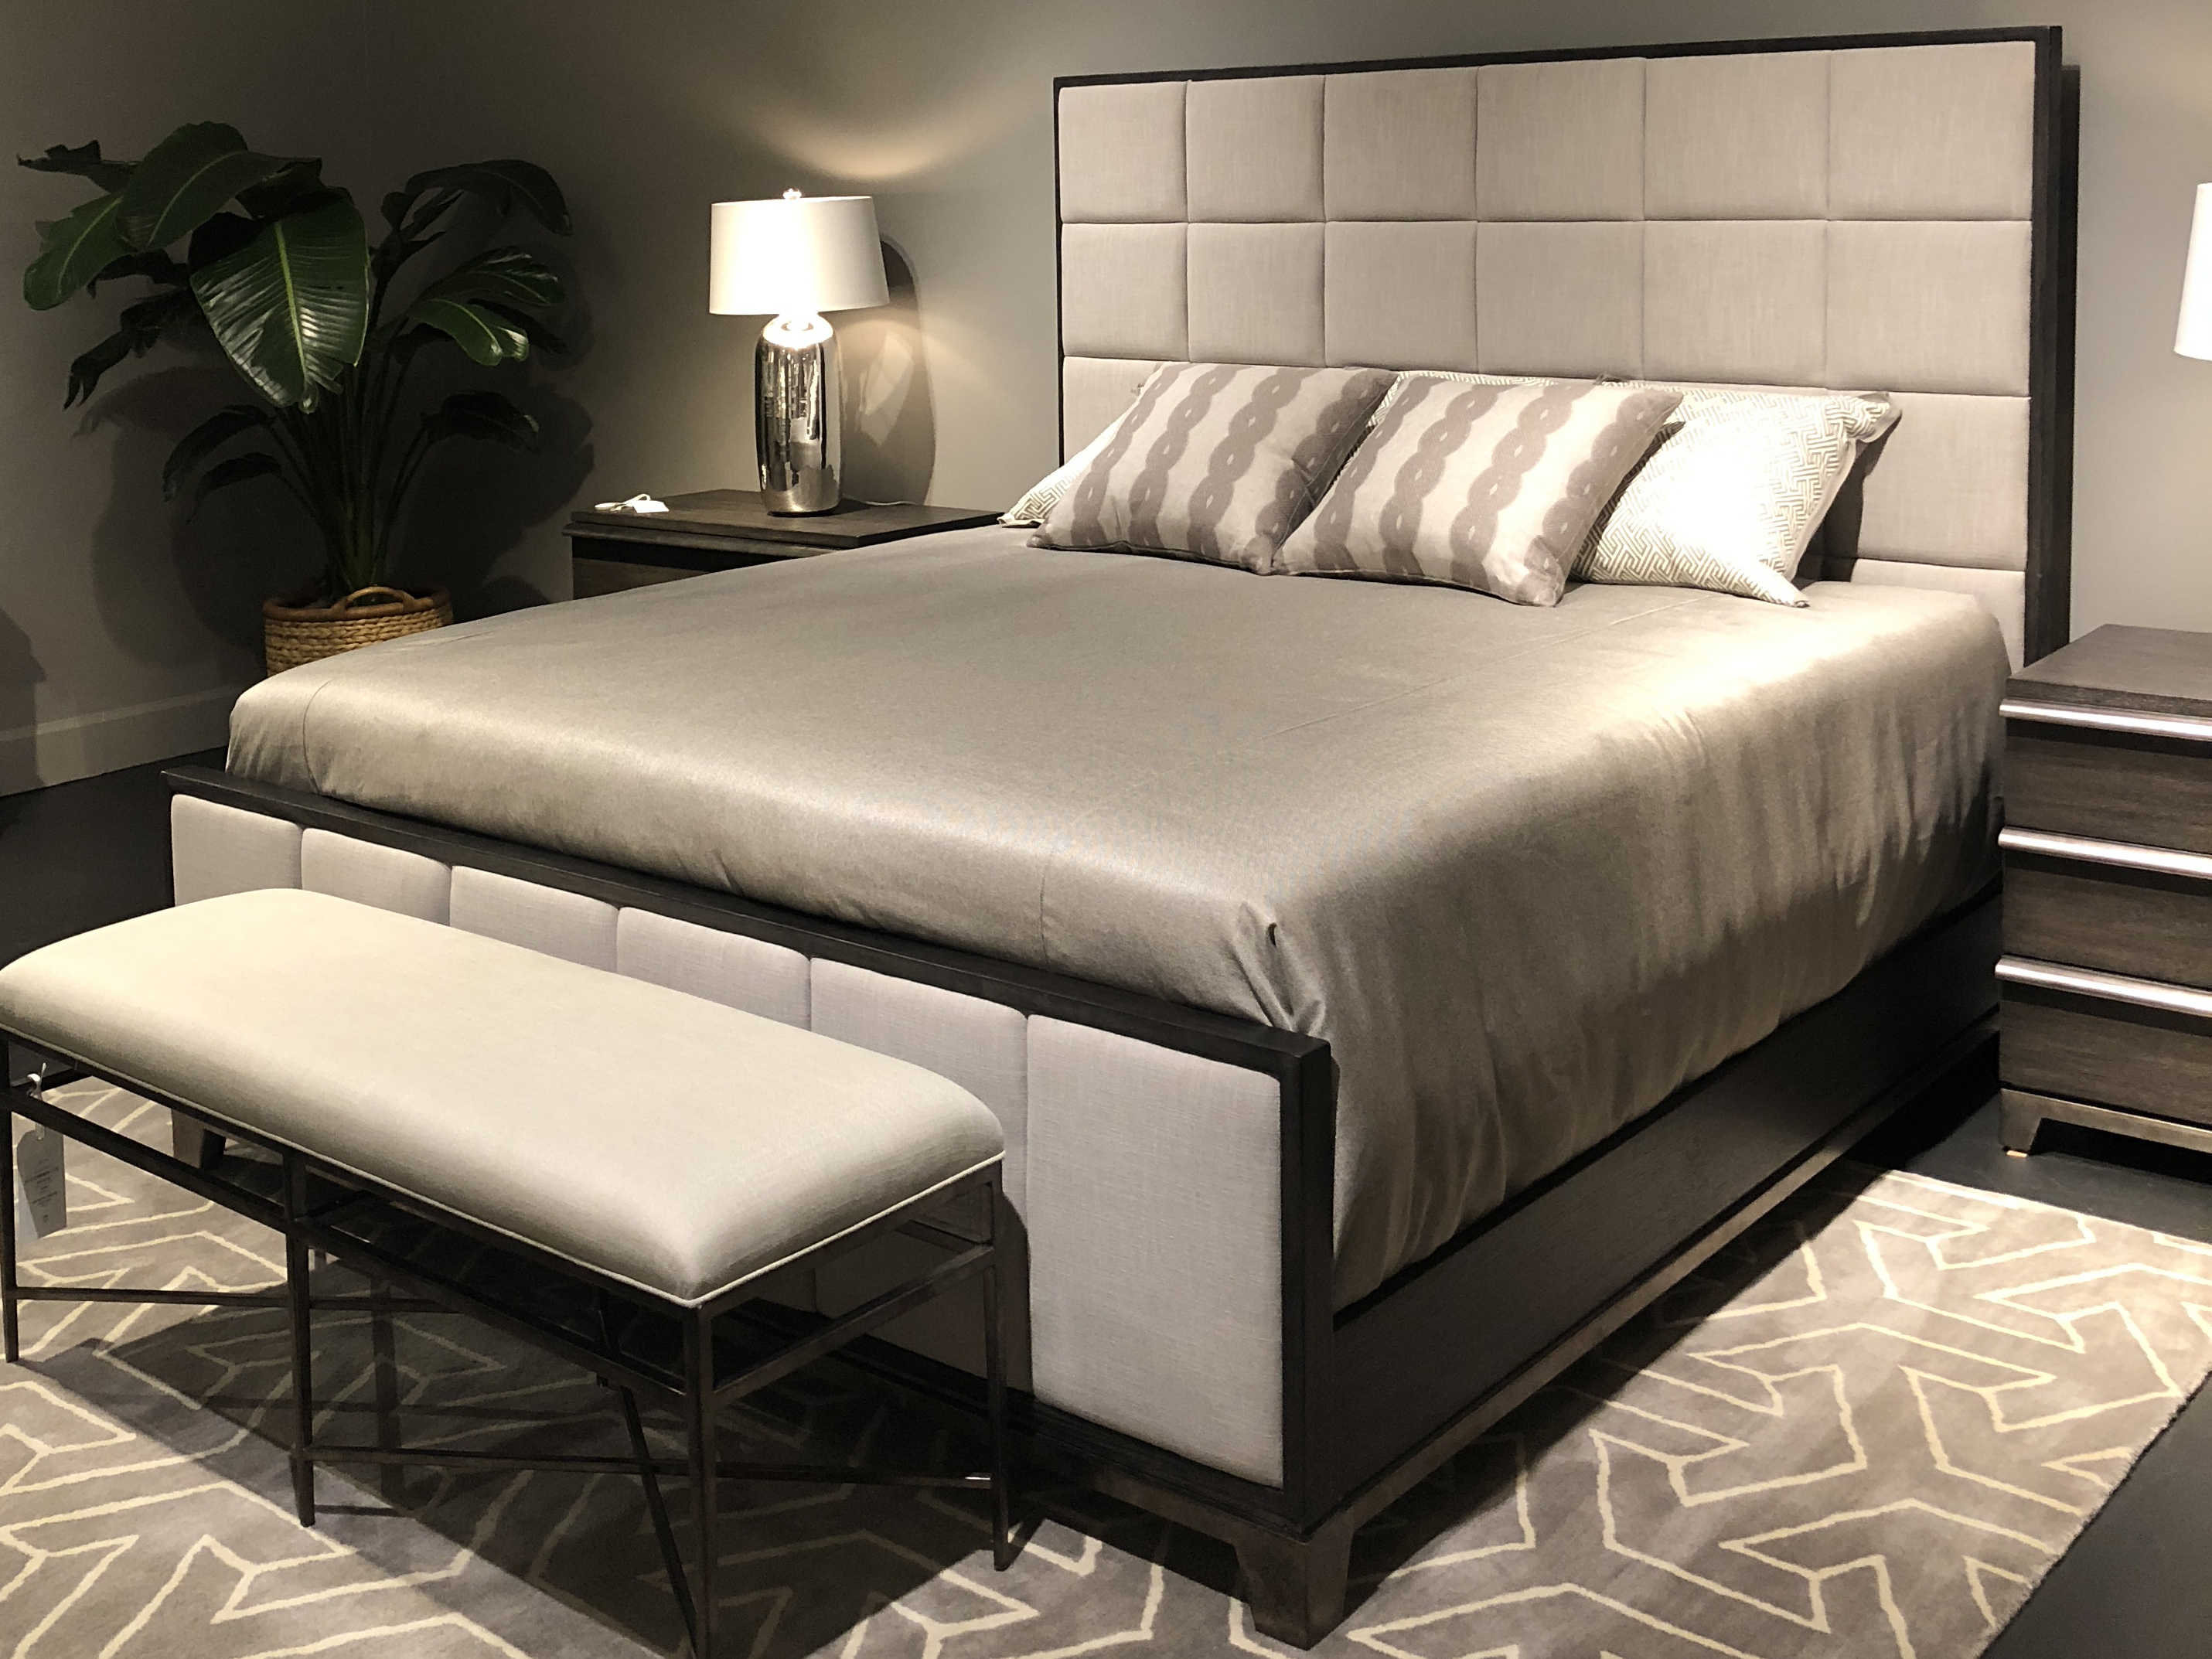 Stanley Furniture Horizon Bedroom Set Sl831g342set